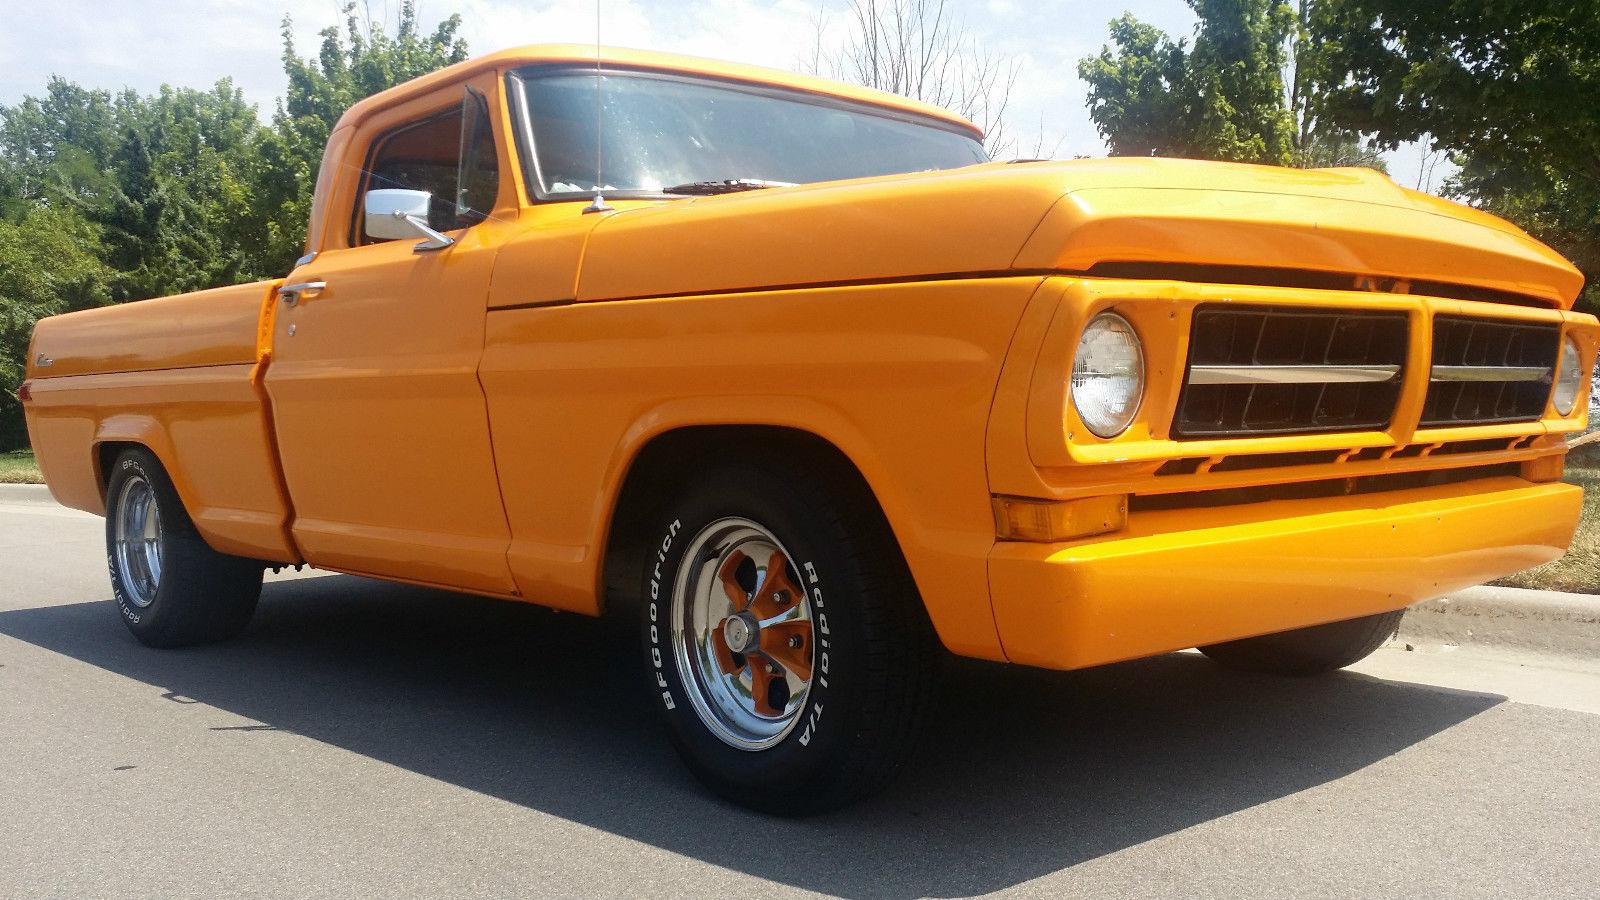 Ford F100 Custom Show Truck Chopped Orange Muscle 1955 Interior